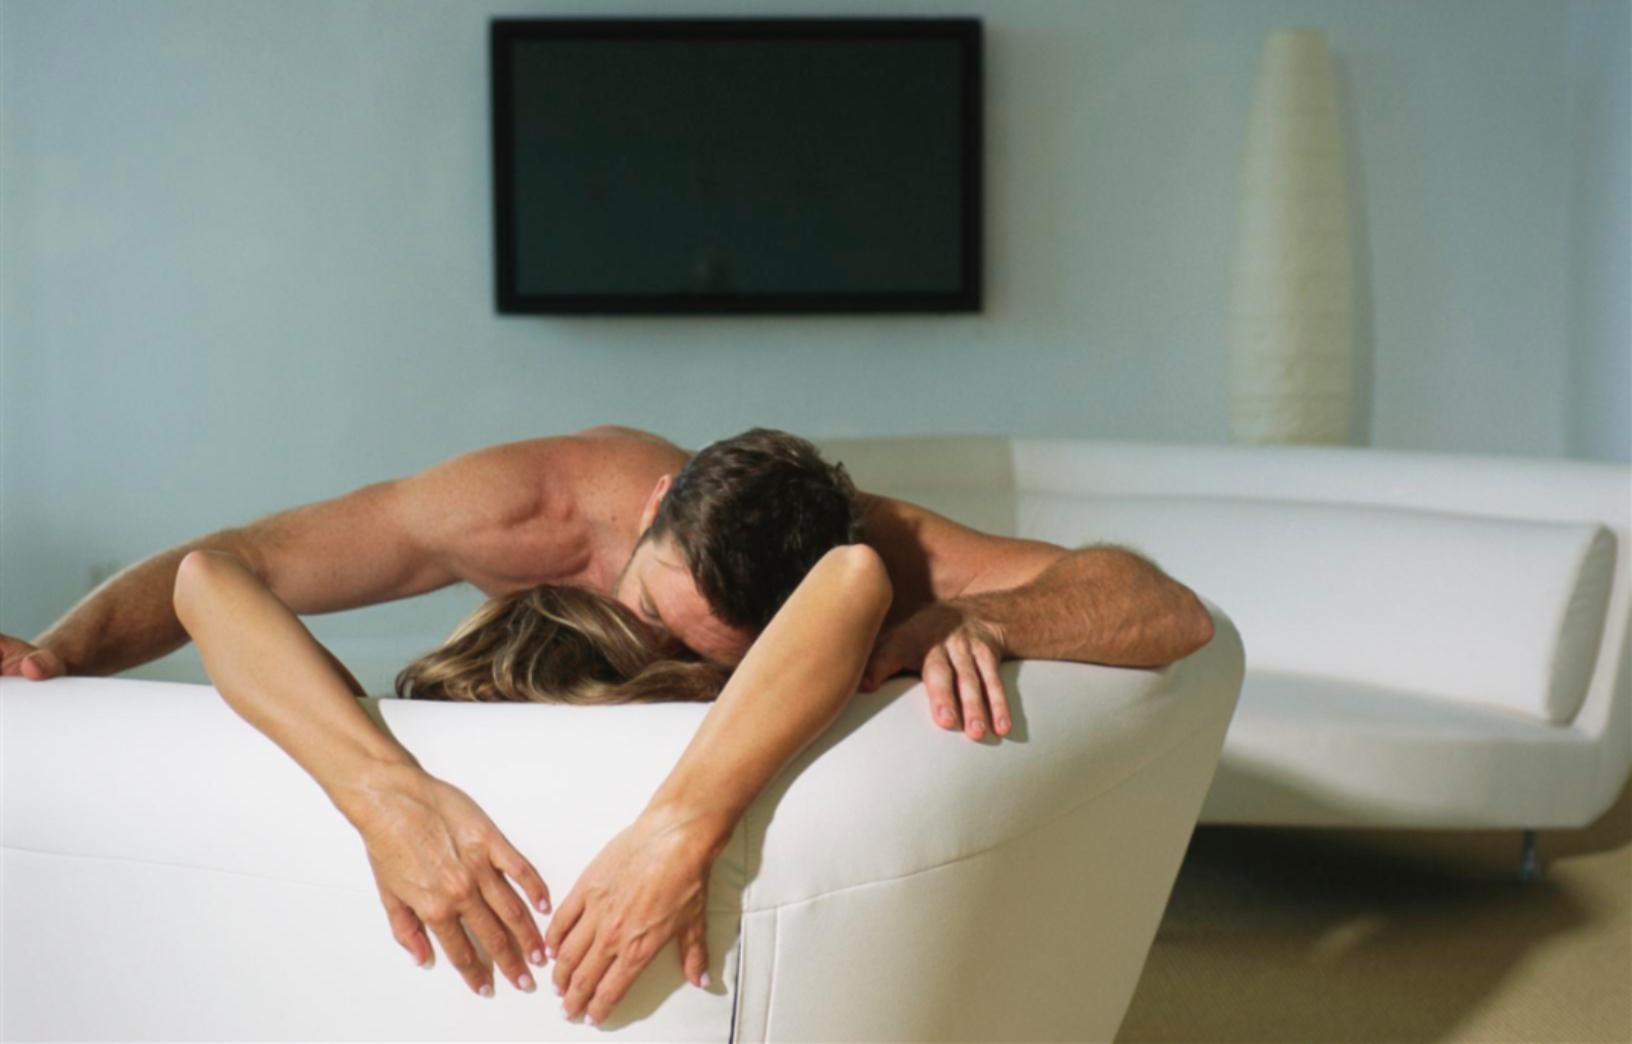 idee piccanti per fare l amore badoocom